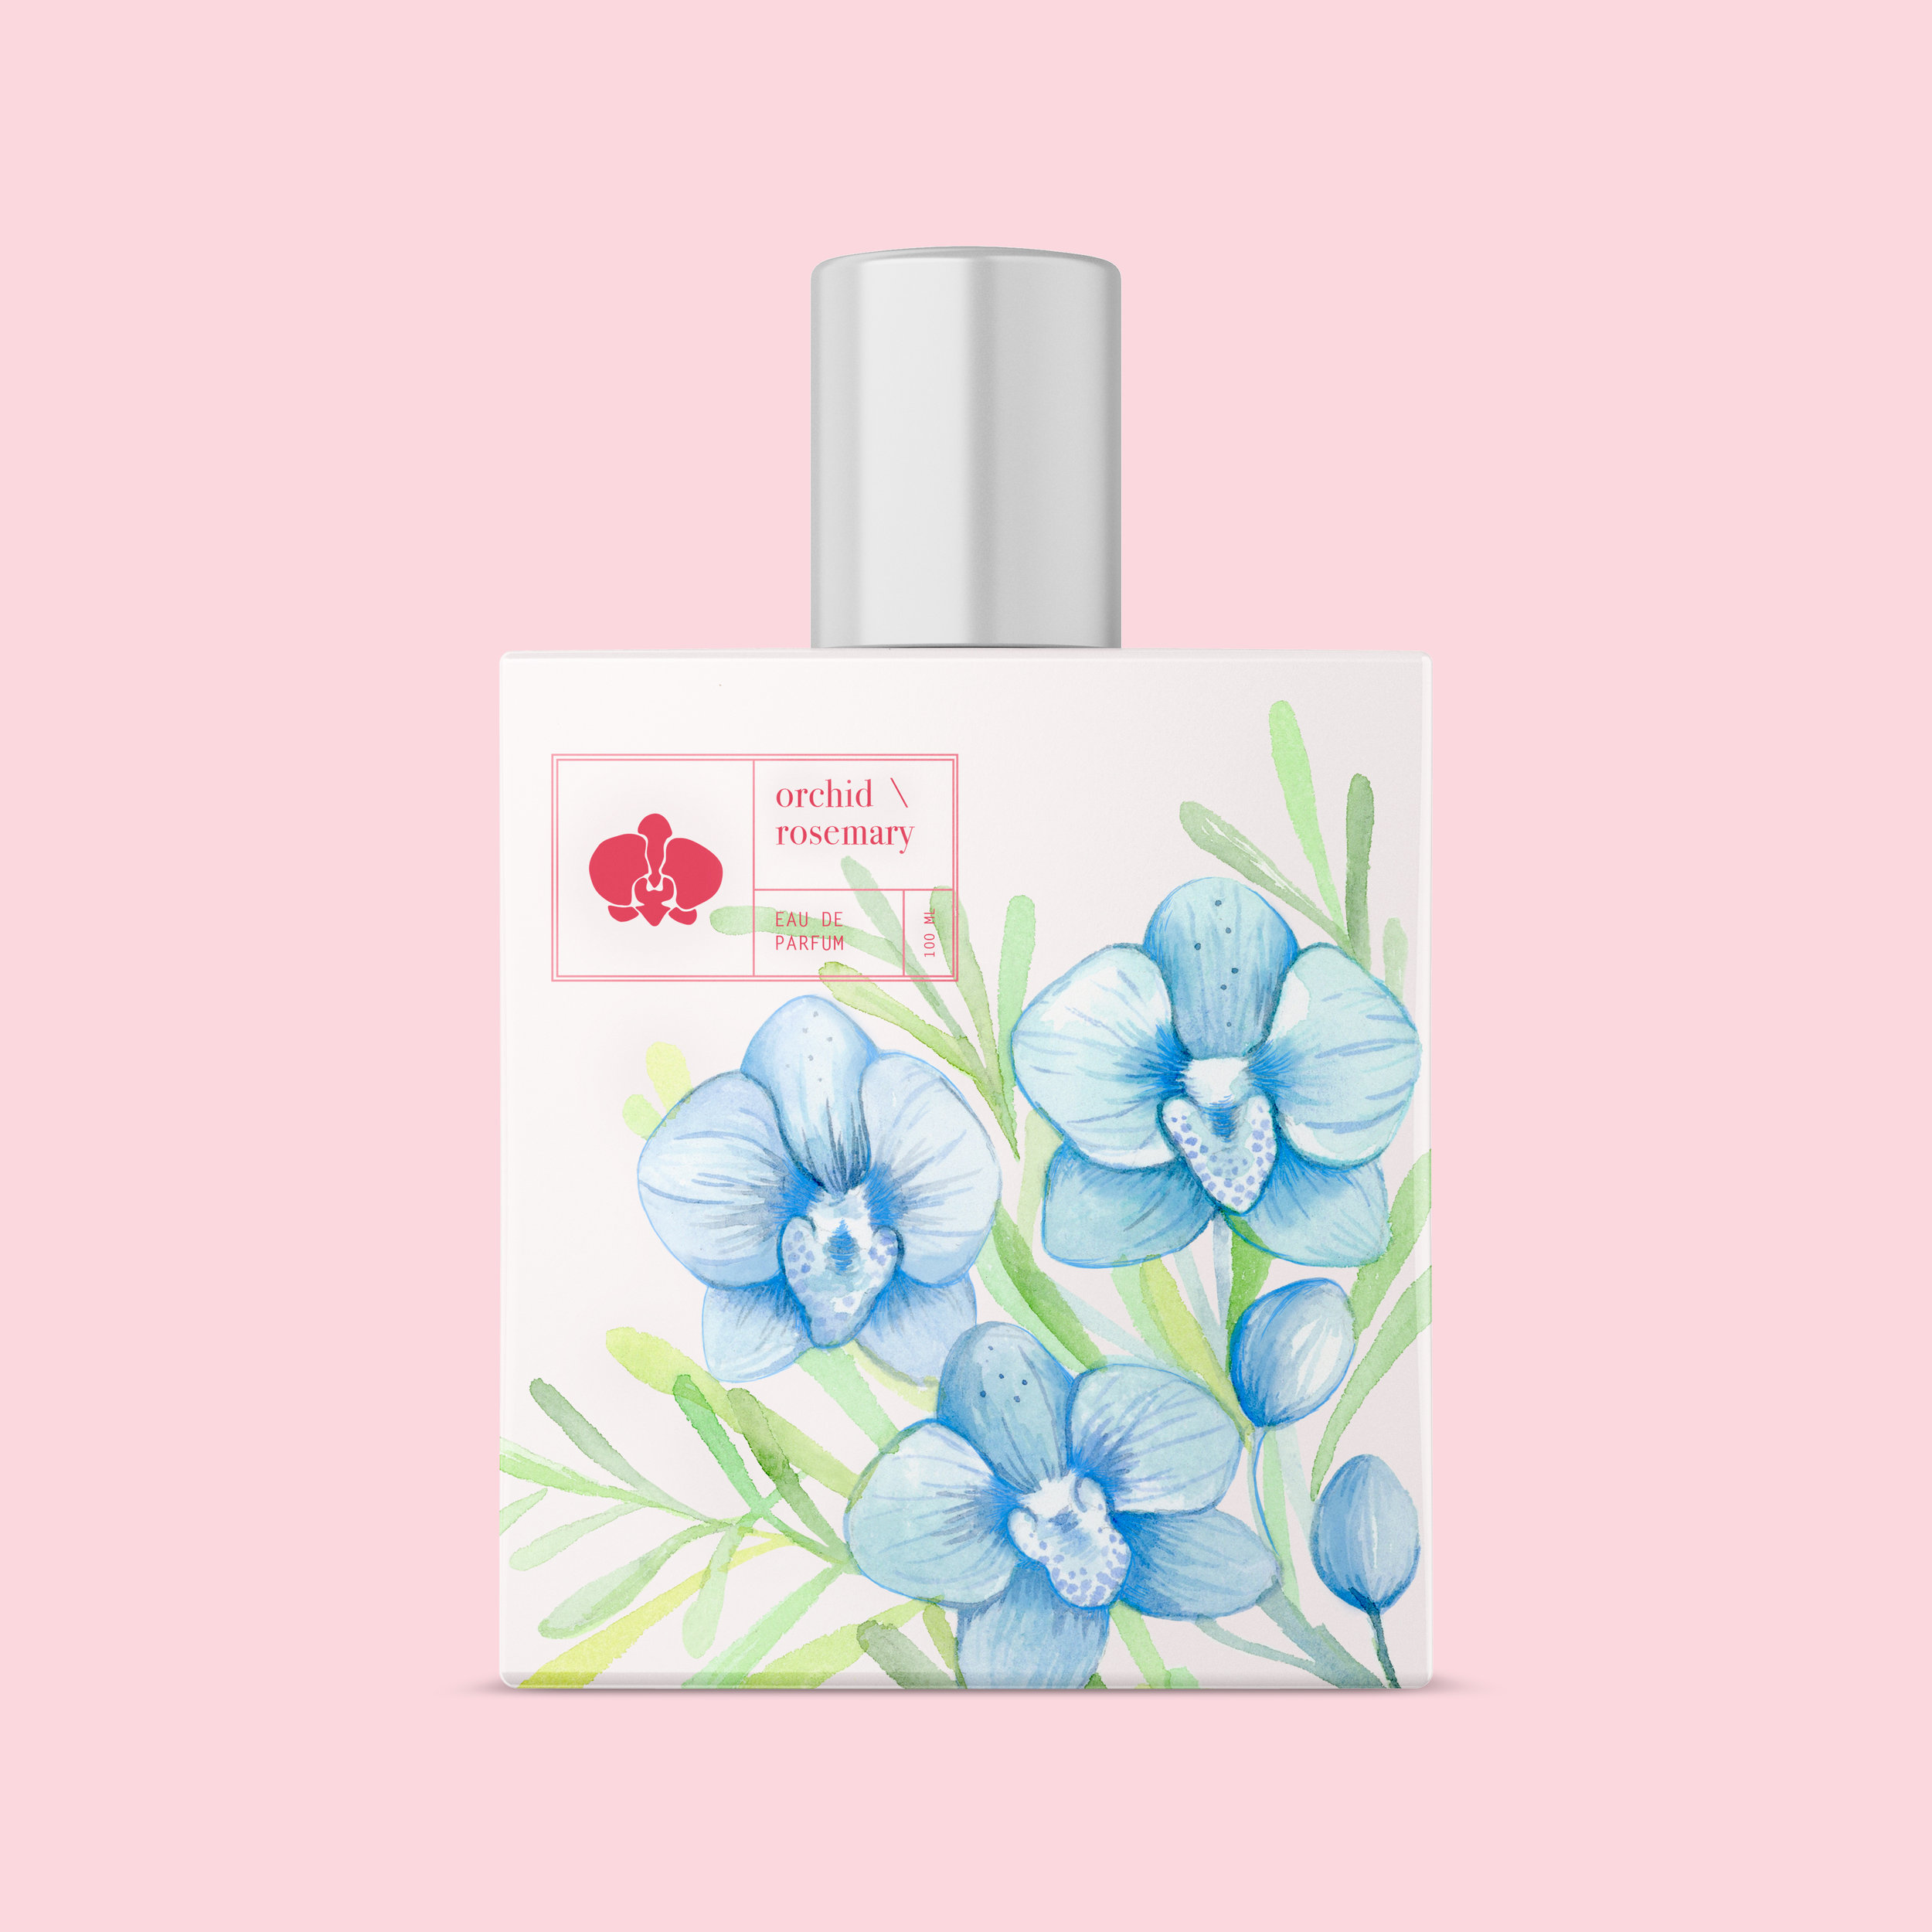 orchid-perfume.jpg